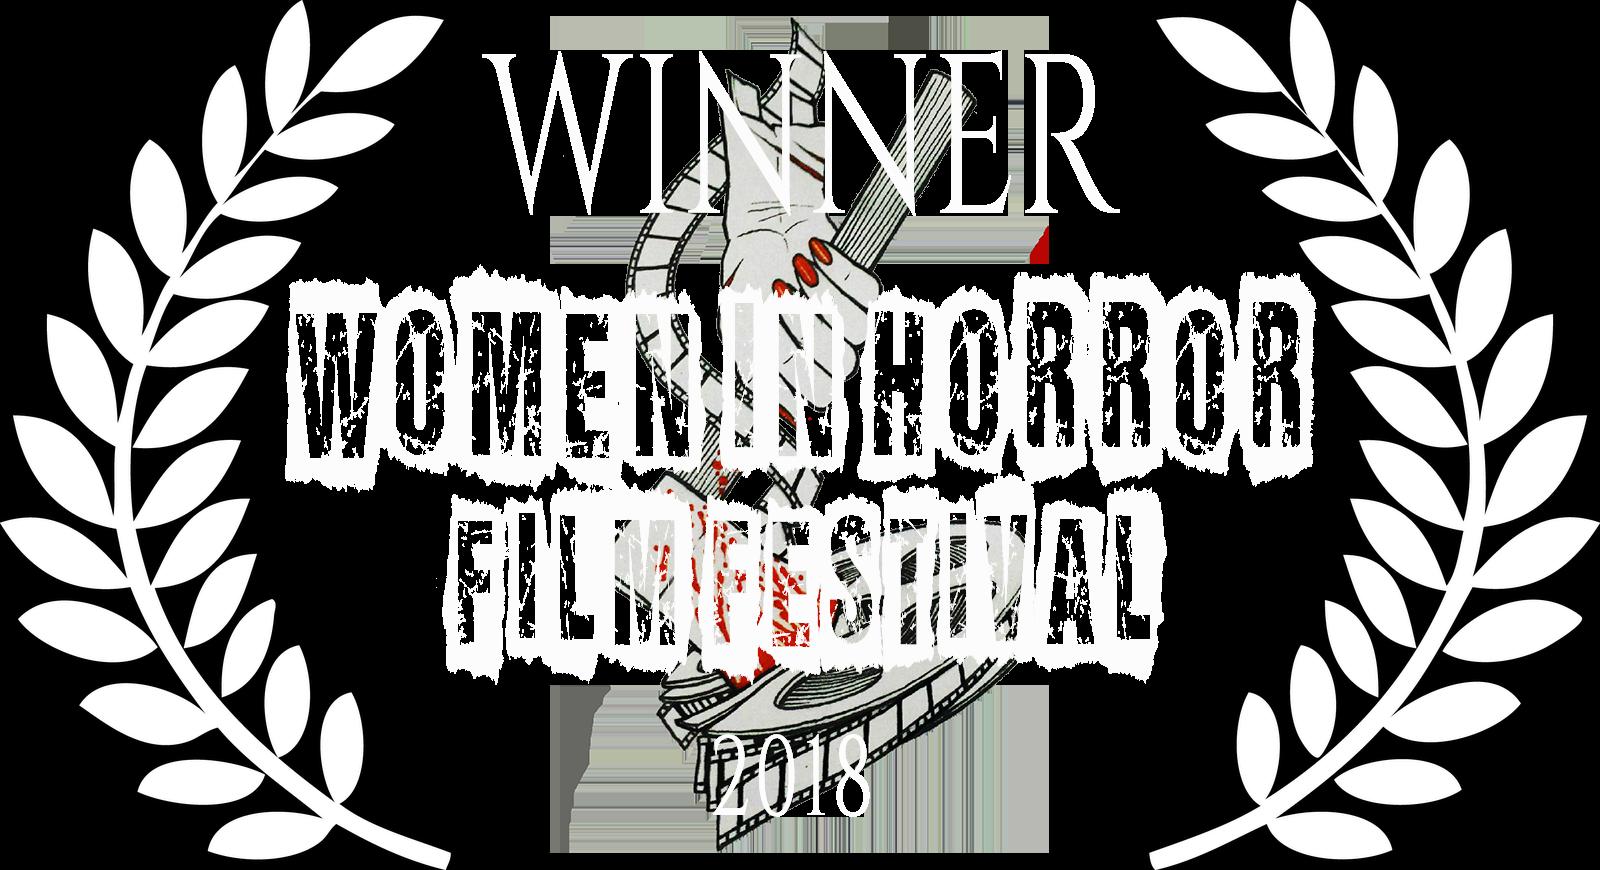 WIHFF_winner_laurel_white.png